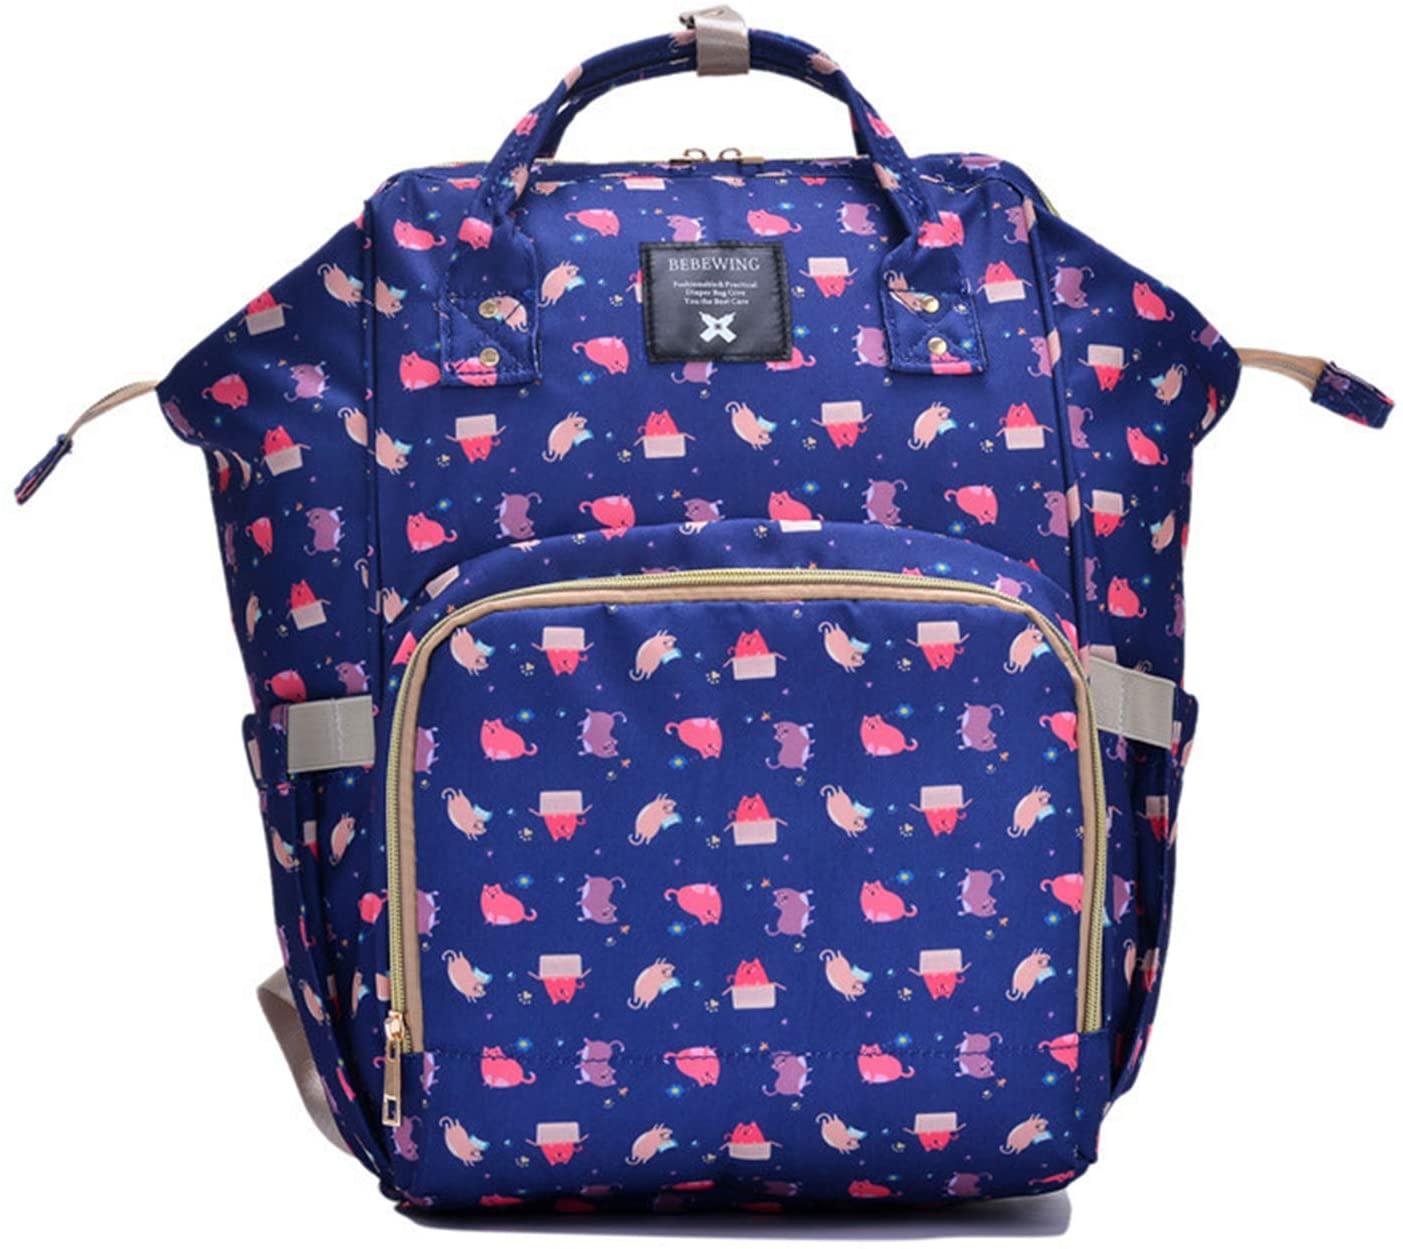 YU-NIYUT Fashion Mummy Maternity Nappy Bag Large Capacity Nappy Bag Travel Backpack for Mom Travellers Nurses Students